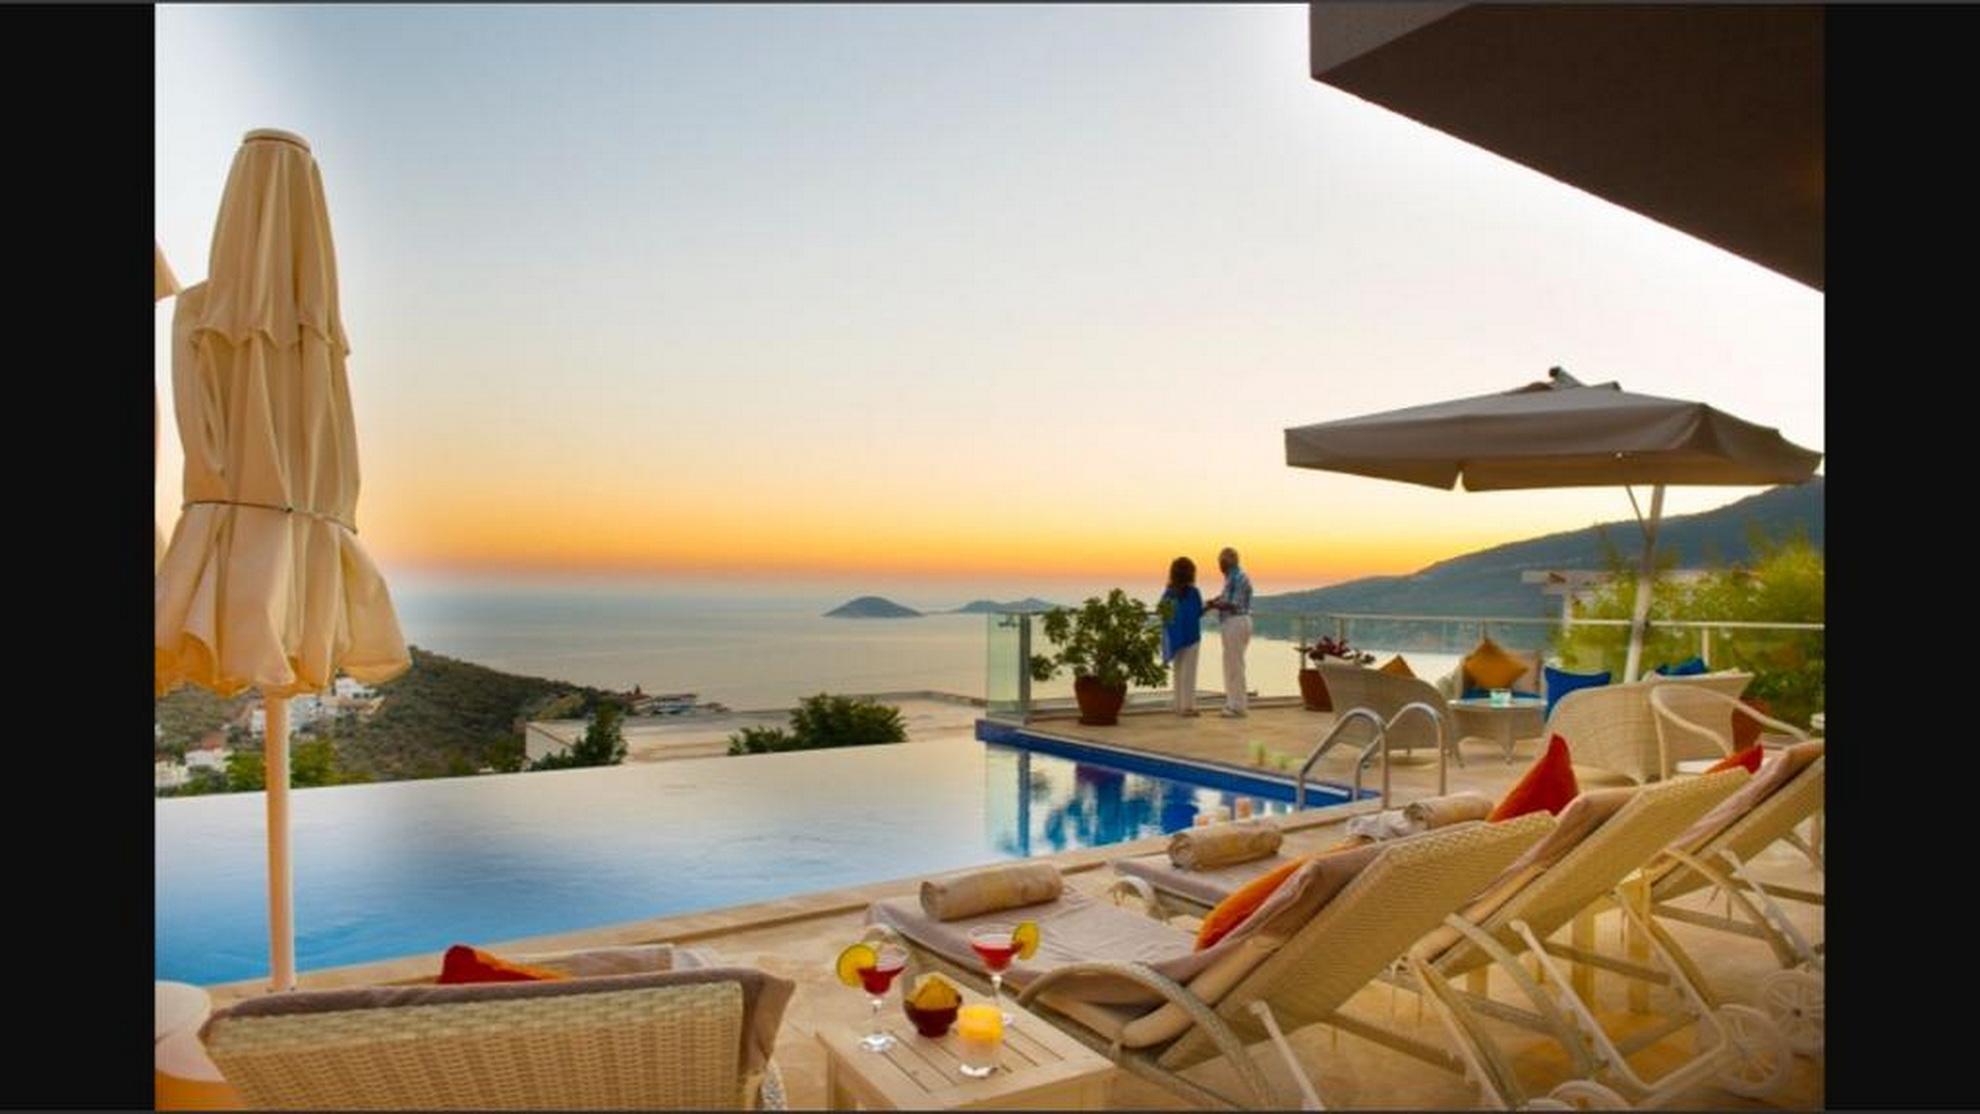 SOLD!!!Luxury 2 Bedroom Apartment with Infinity Pool in Ortaalan Kalkan